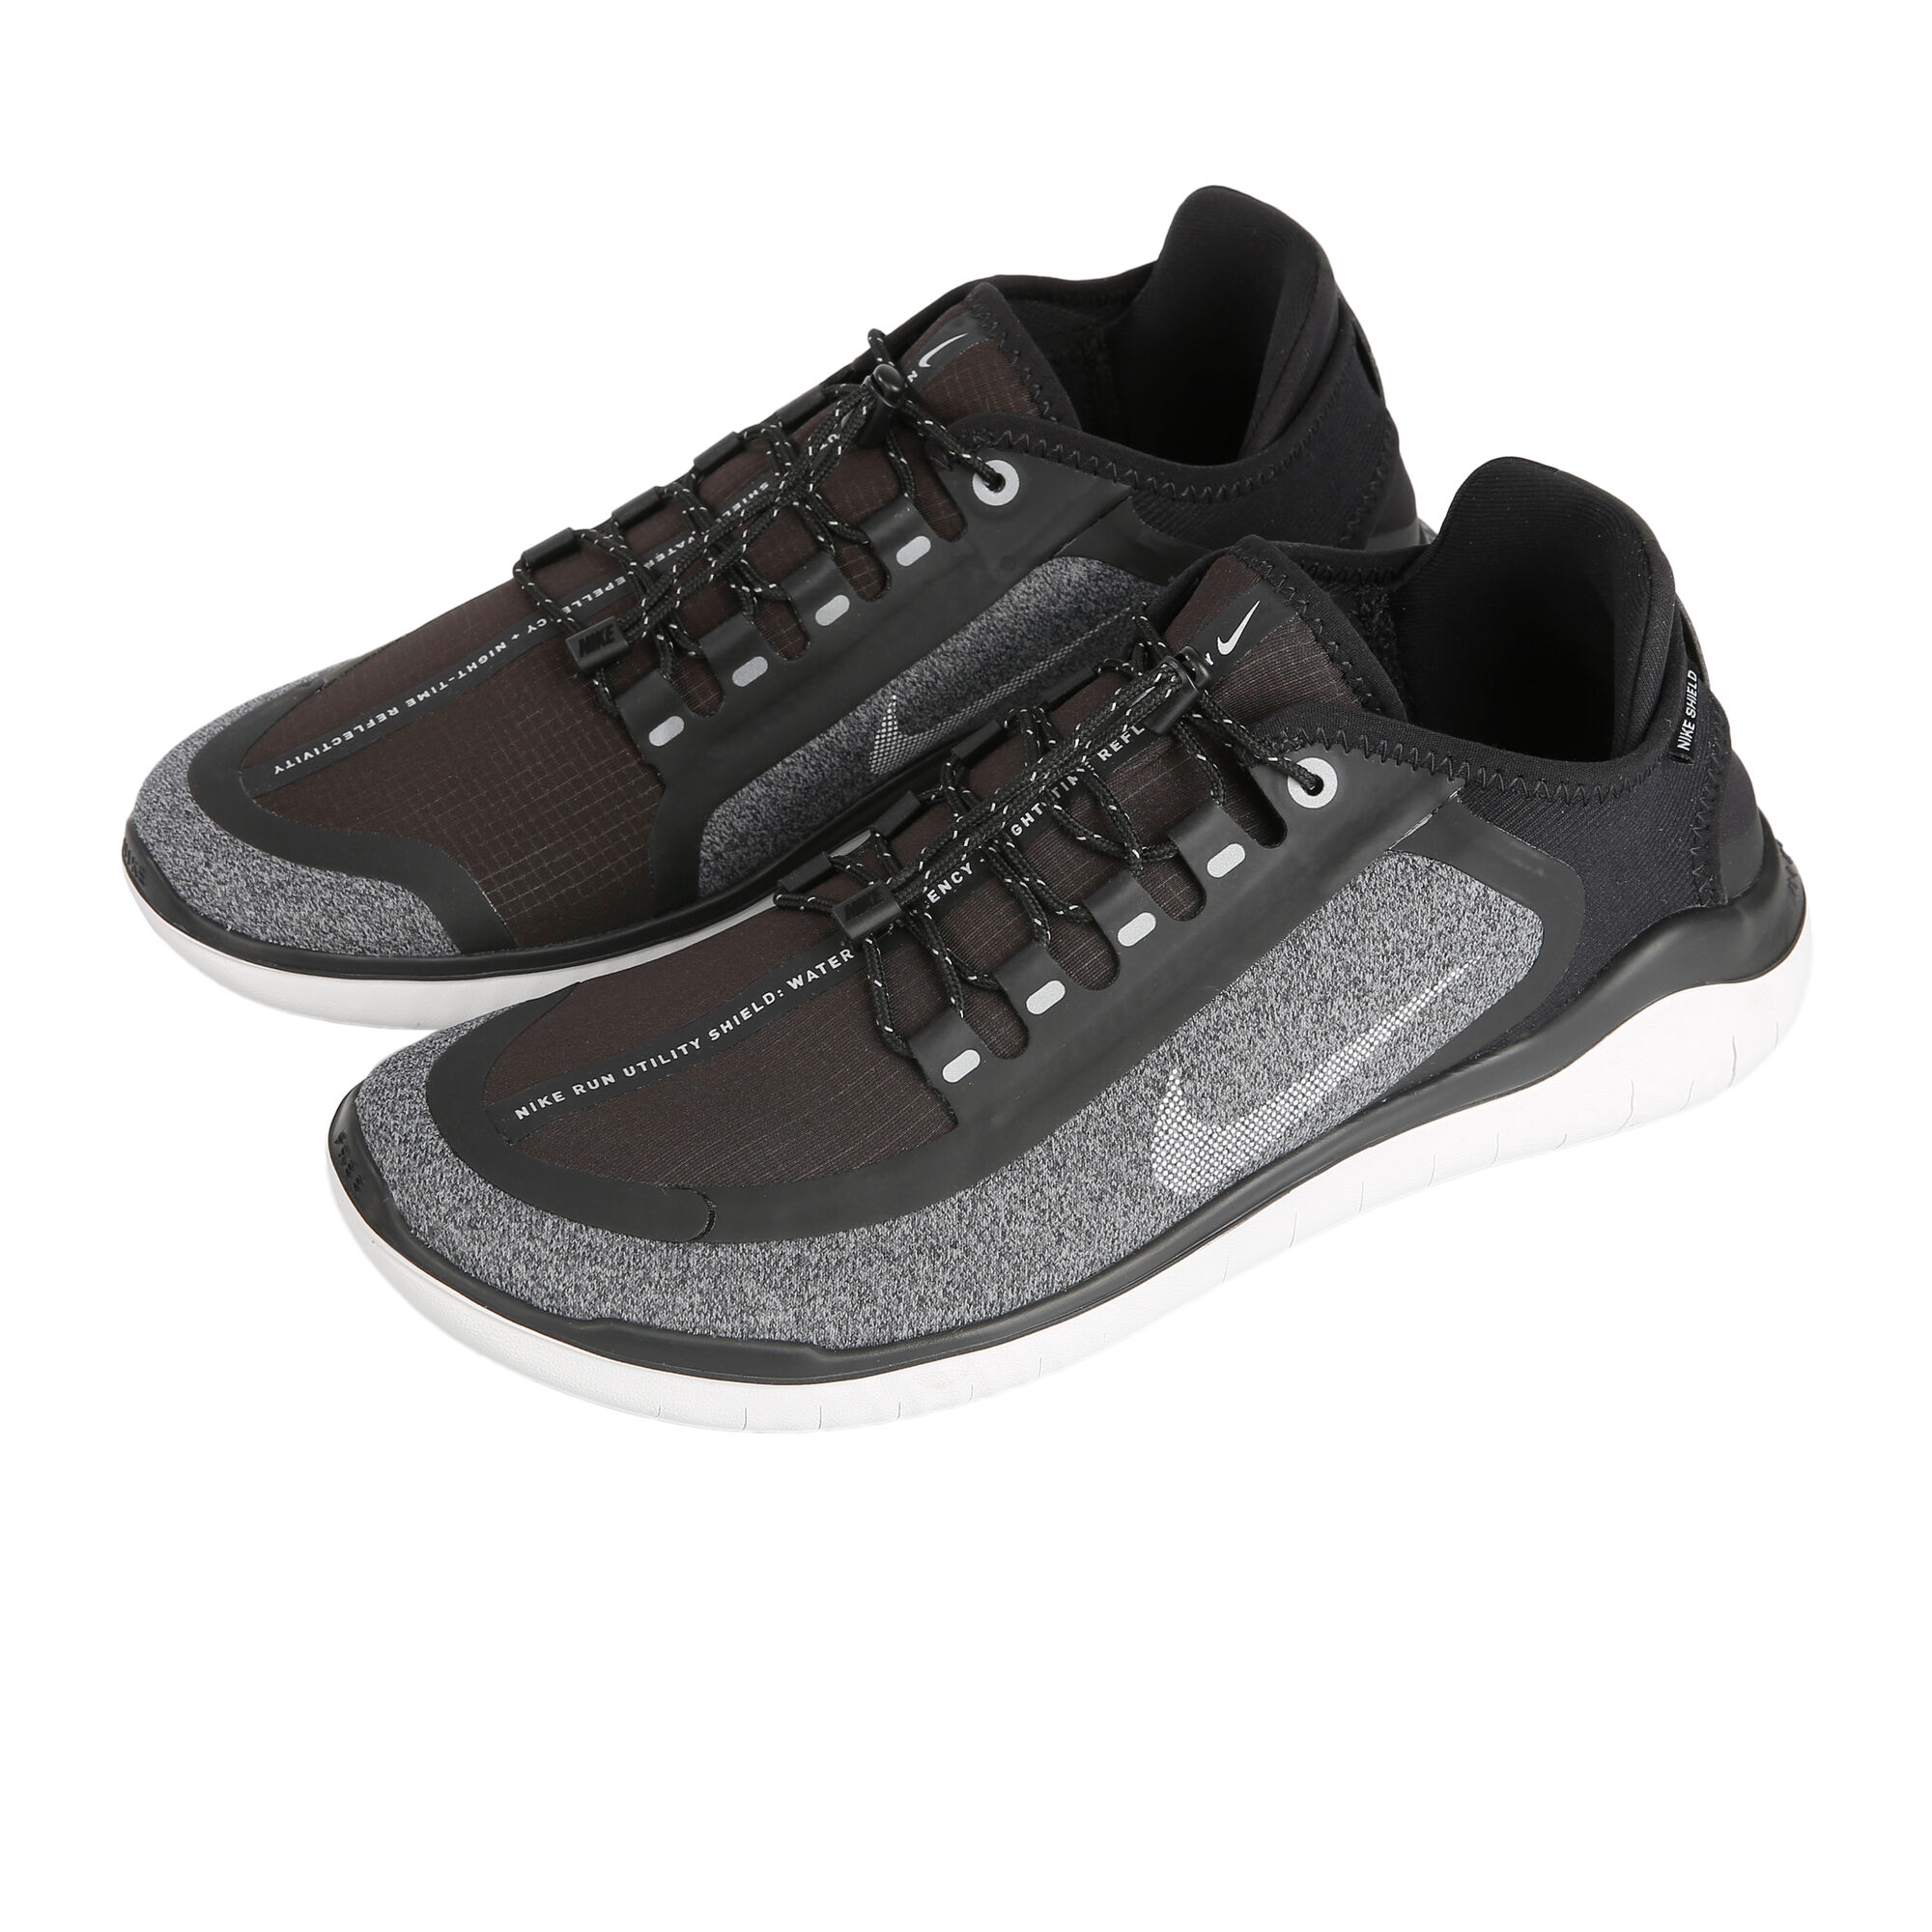 online store 9f221 4ece5 Nike  Nike  Nike  Nike  Nike  Nike  Nike  Nike  Nike. Free Run 2018 Shield  Men ...